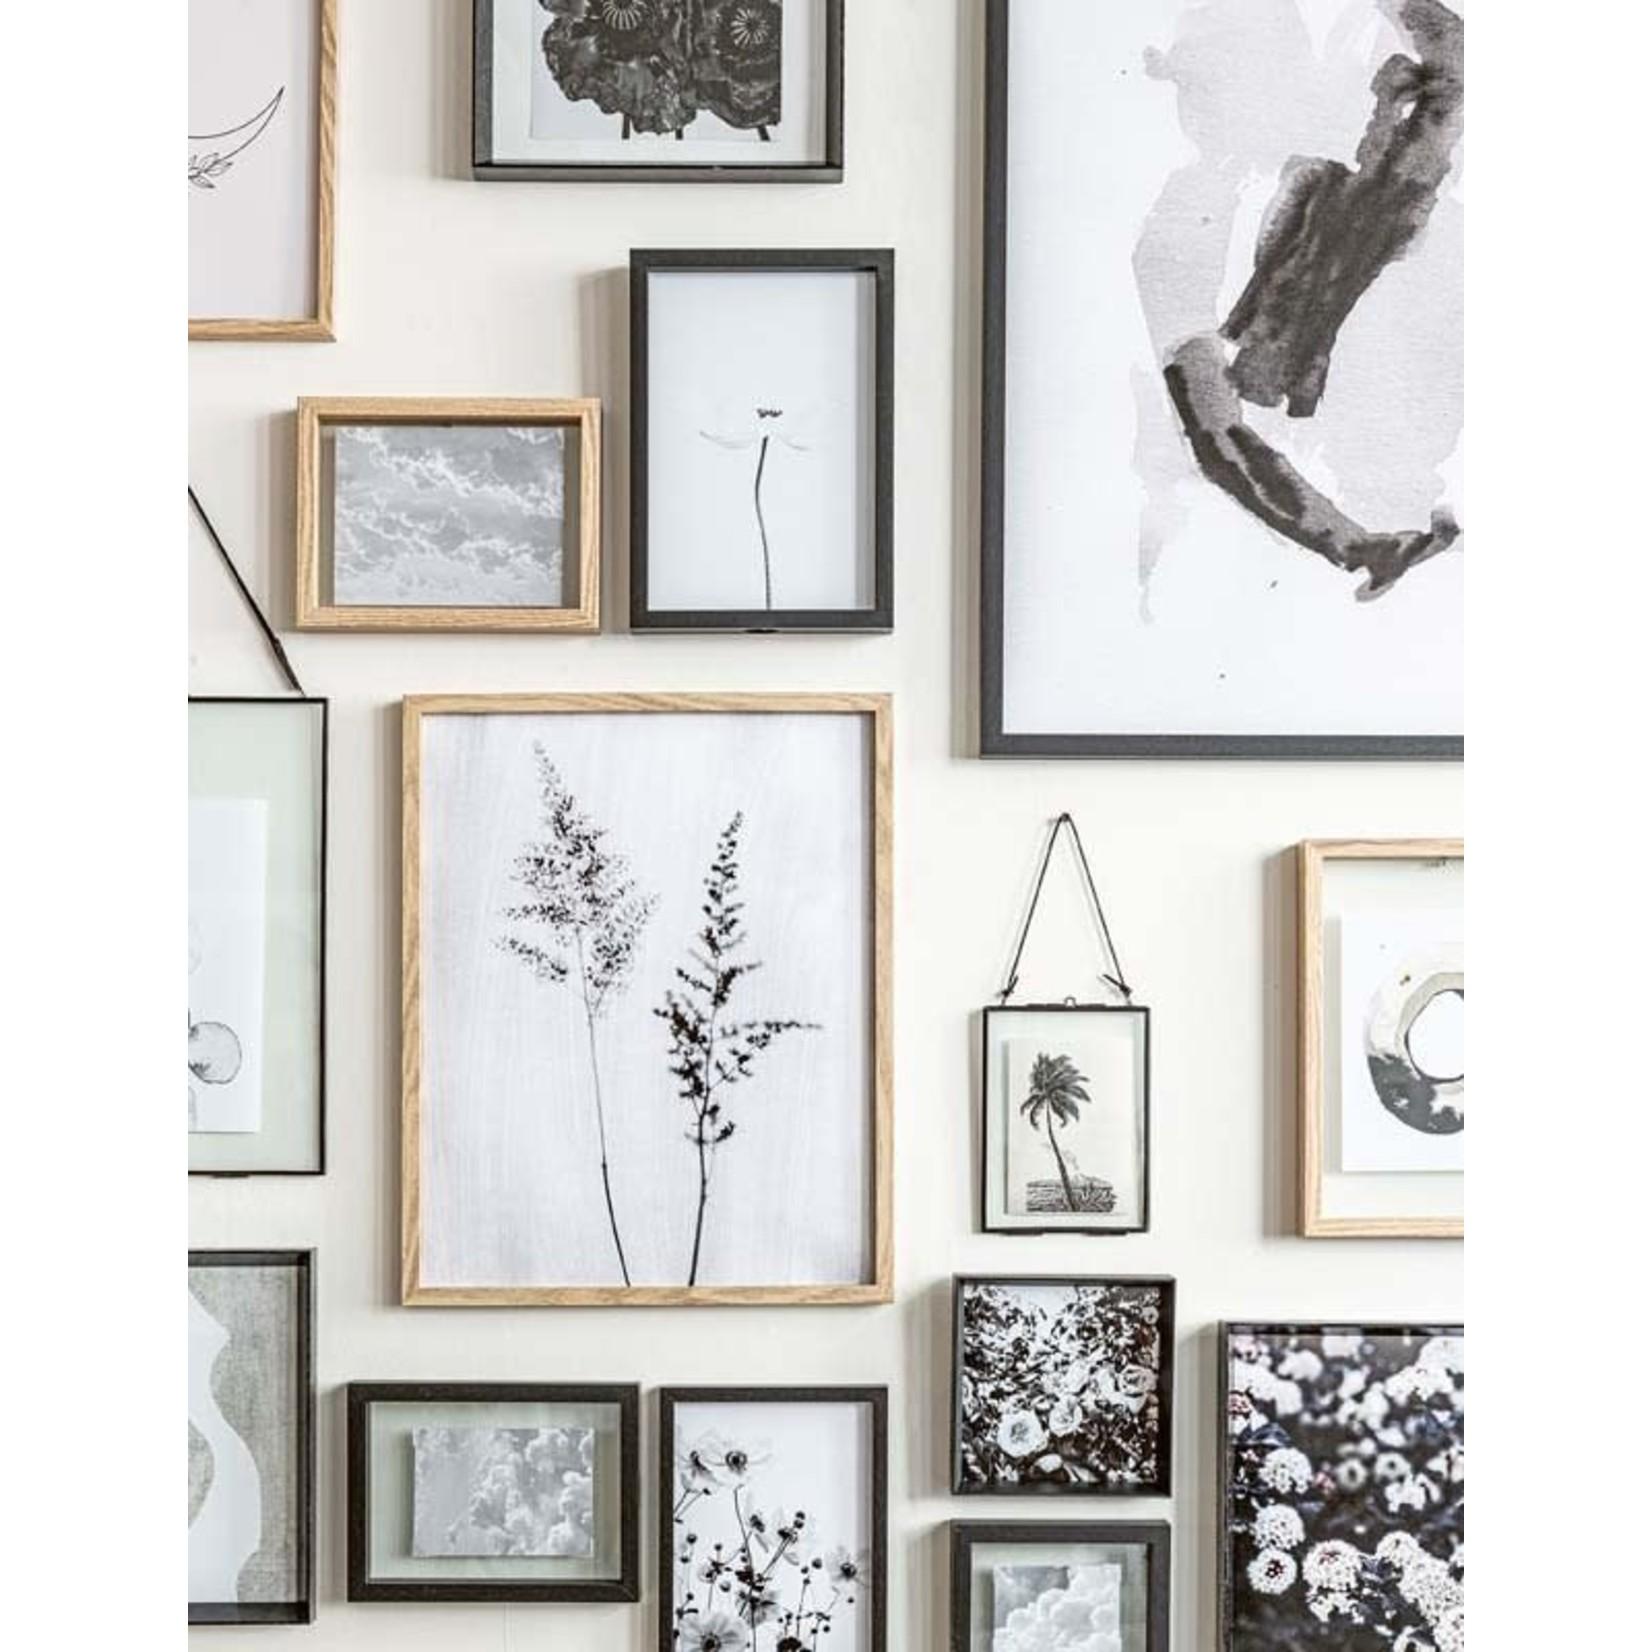 vtwonen Basic collection Photo Frame Wood Black A7 13.5x18x4cm